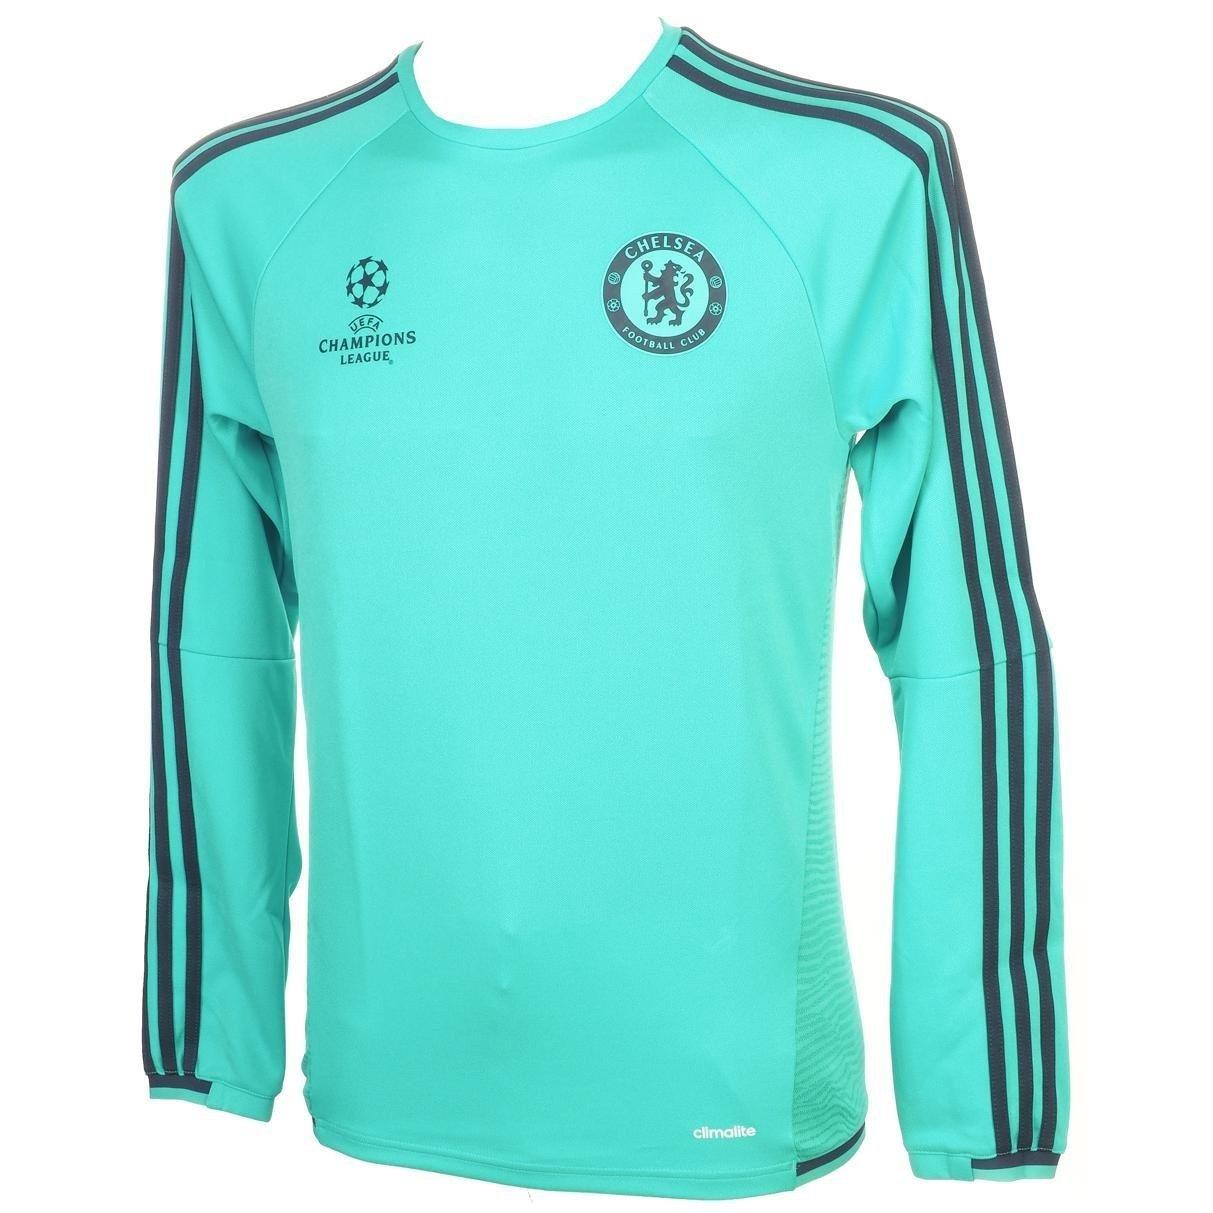 2015 2016 Chelsea Adidas EU Training Top (Vivid Mint